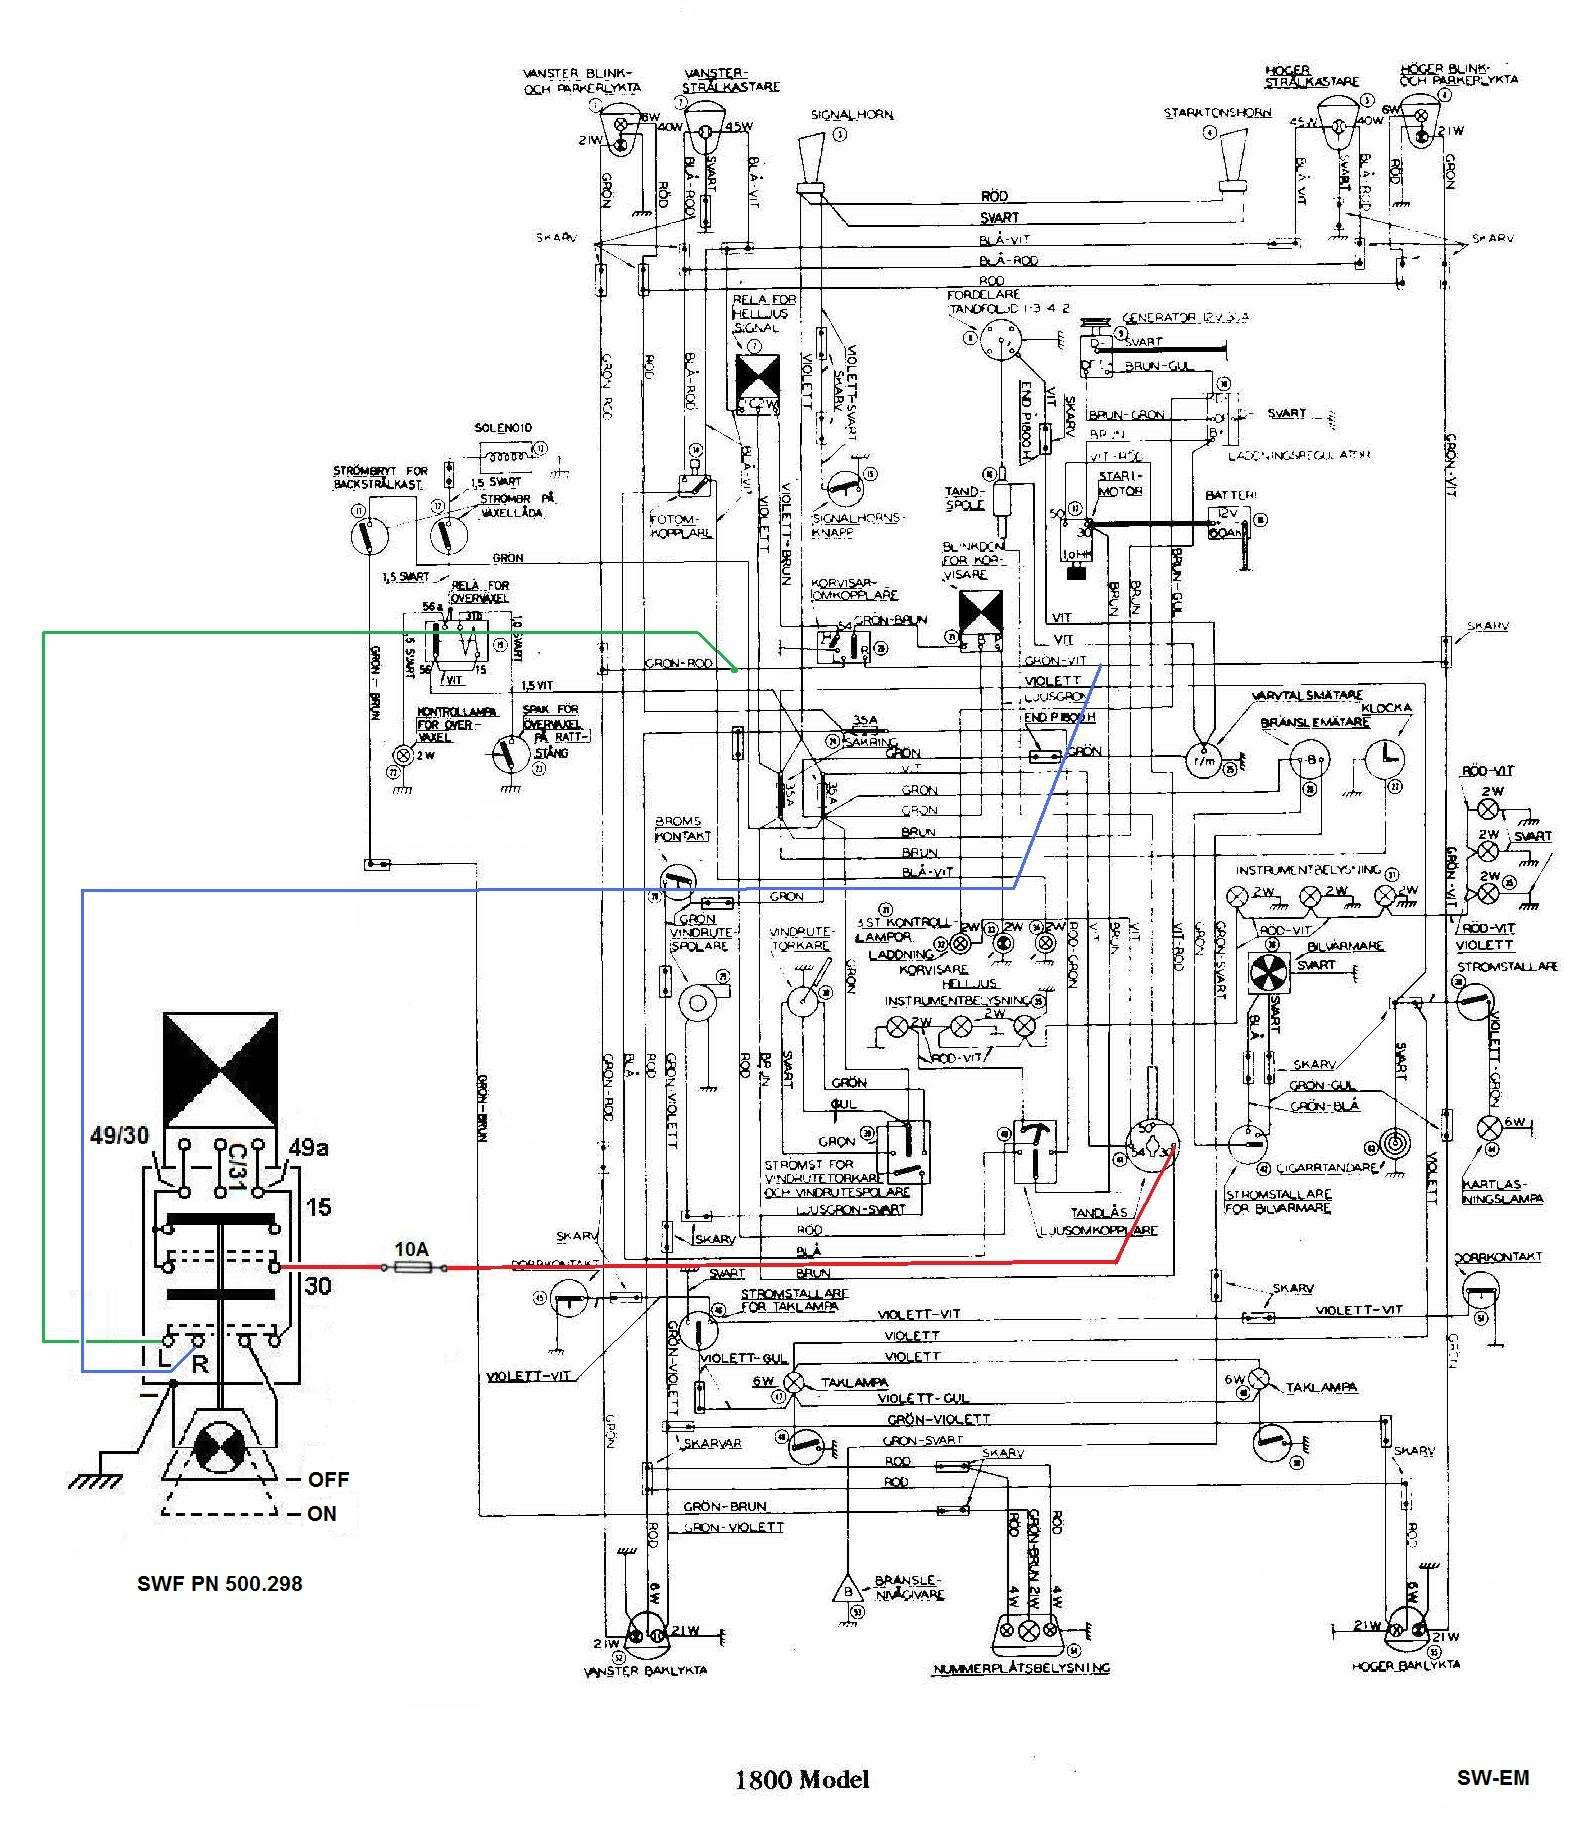 hight resolution of wiring diagram 3 way switch beautiful swf wiring diagram